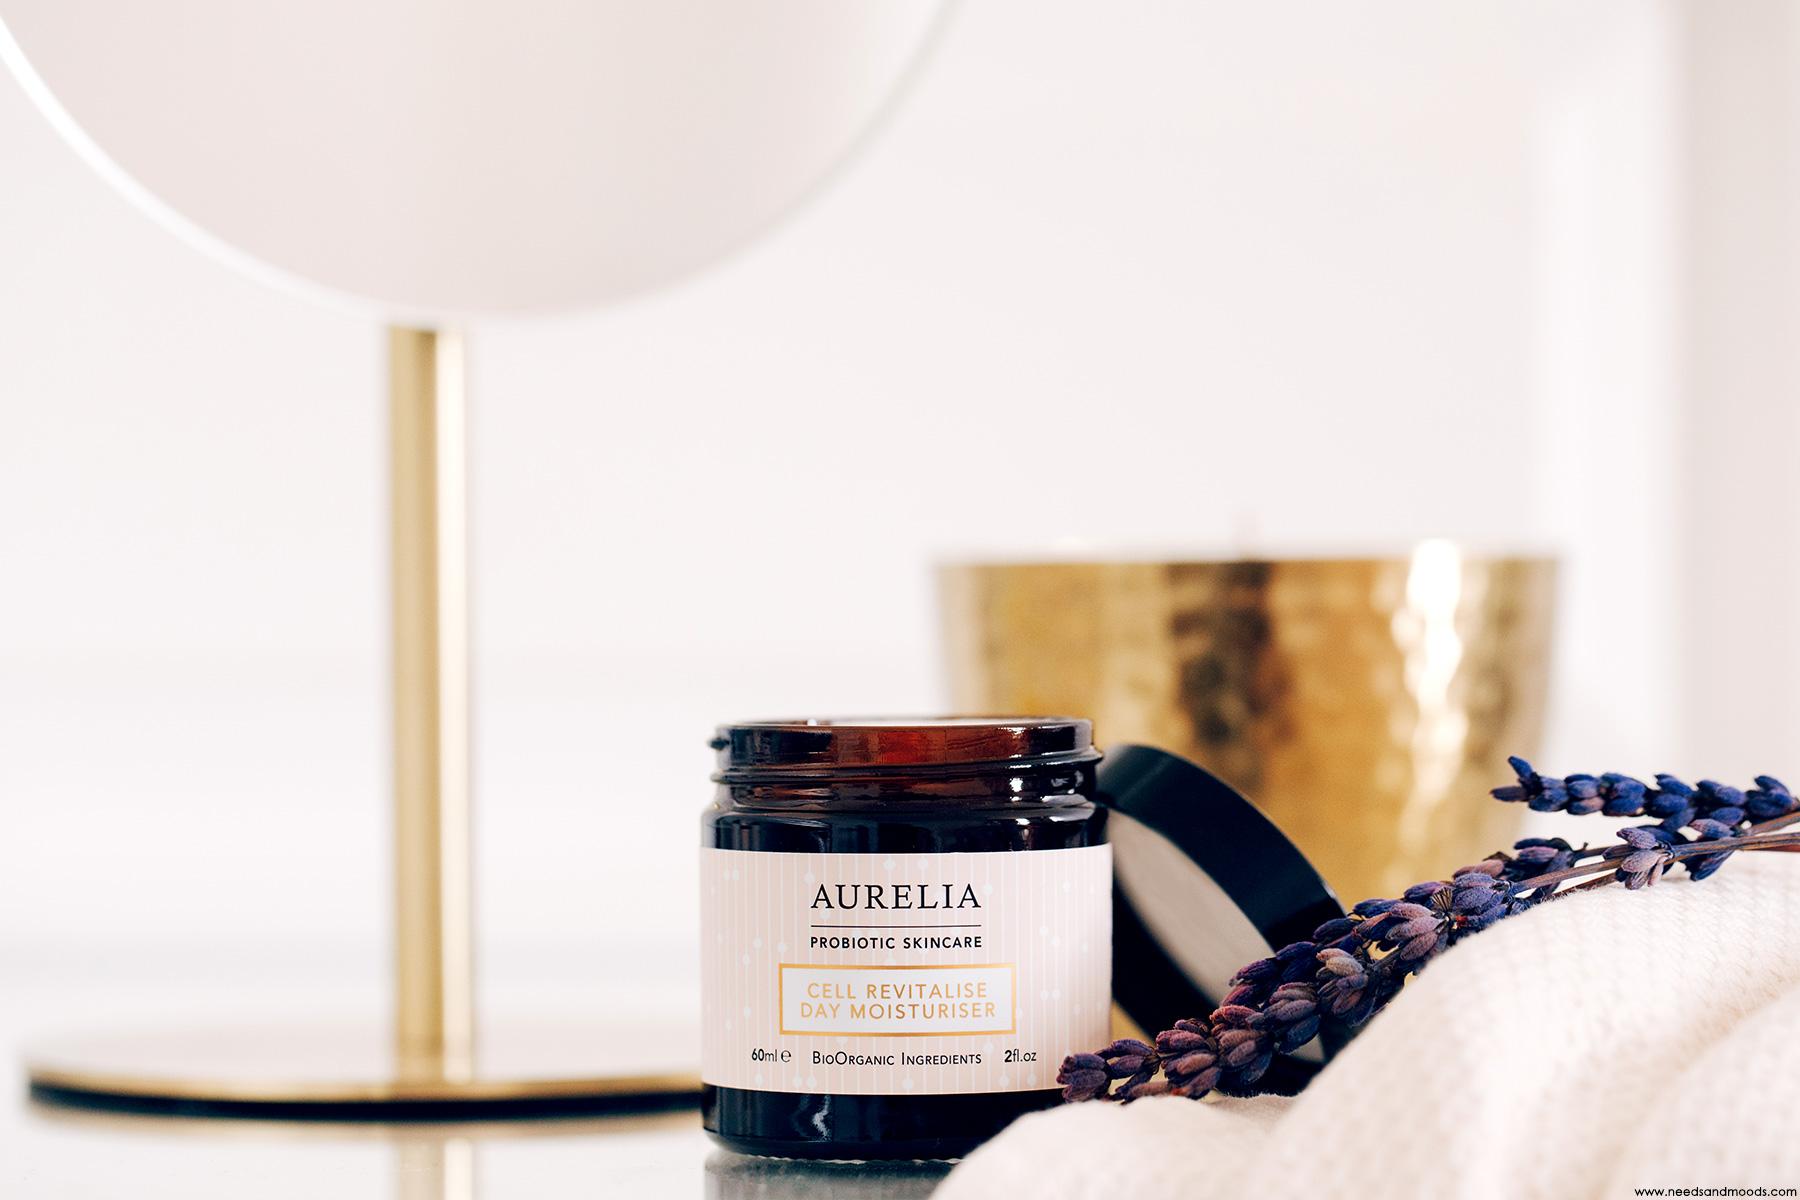 aurelia probiotic cell revitalise day moisturiser avis